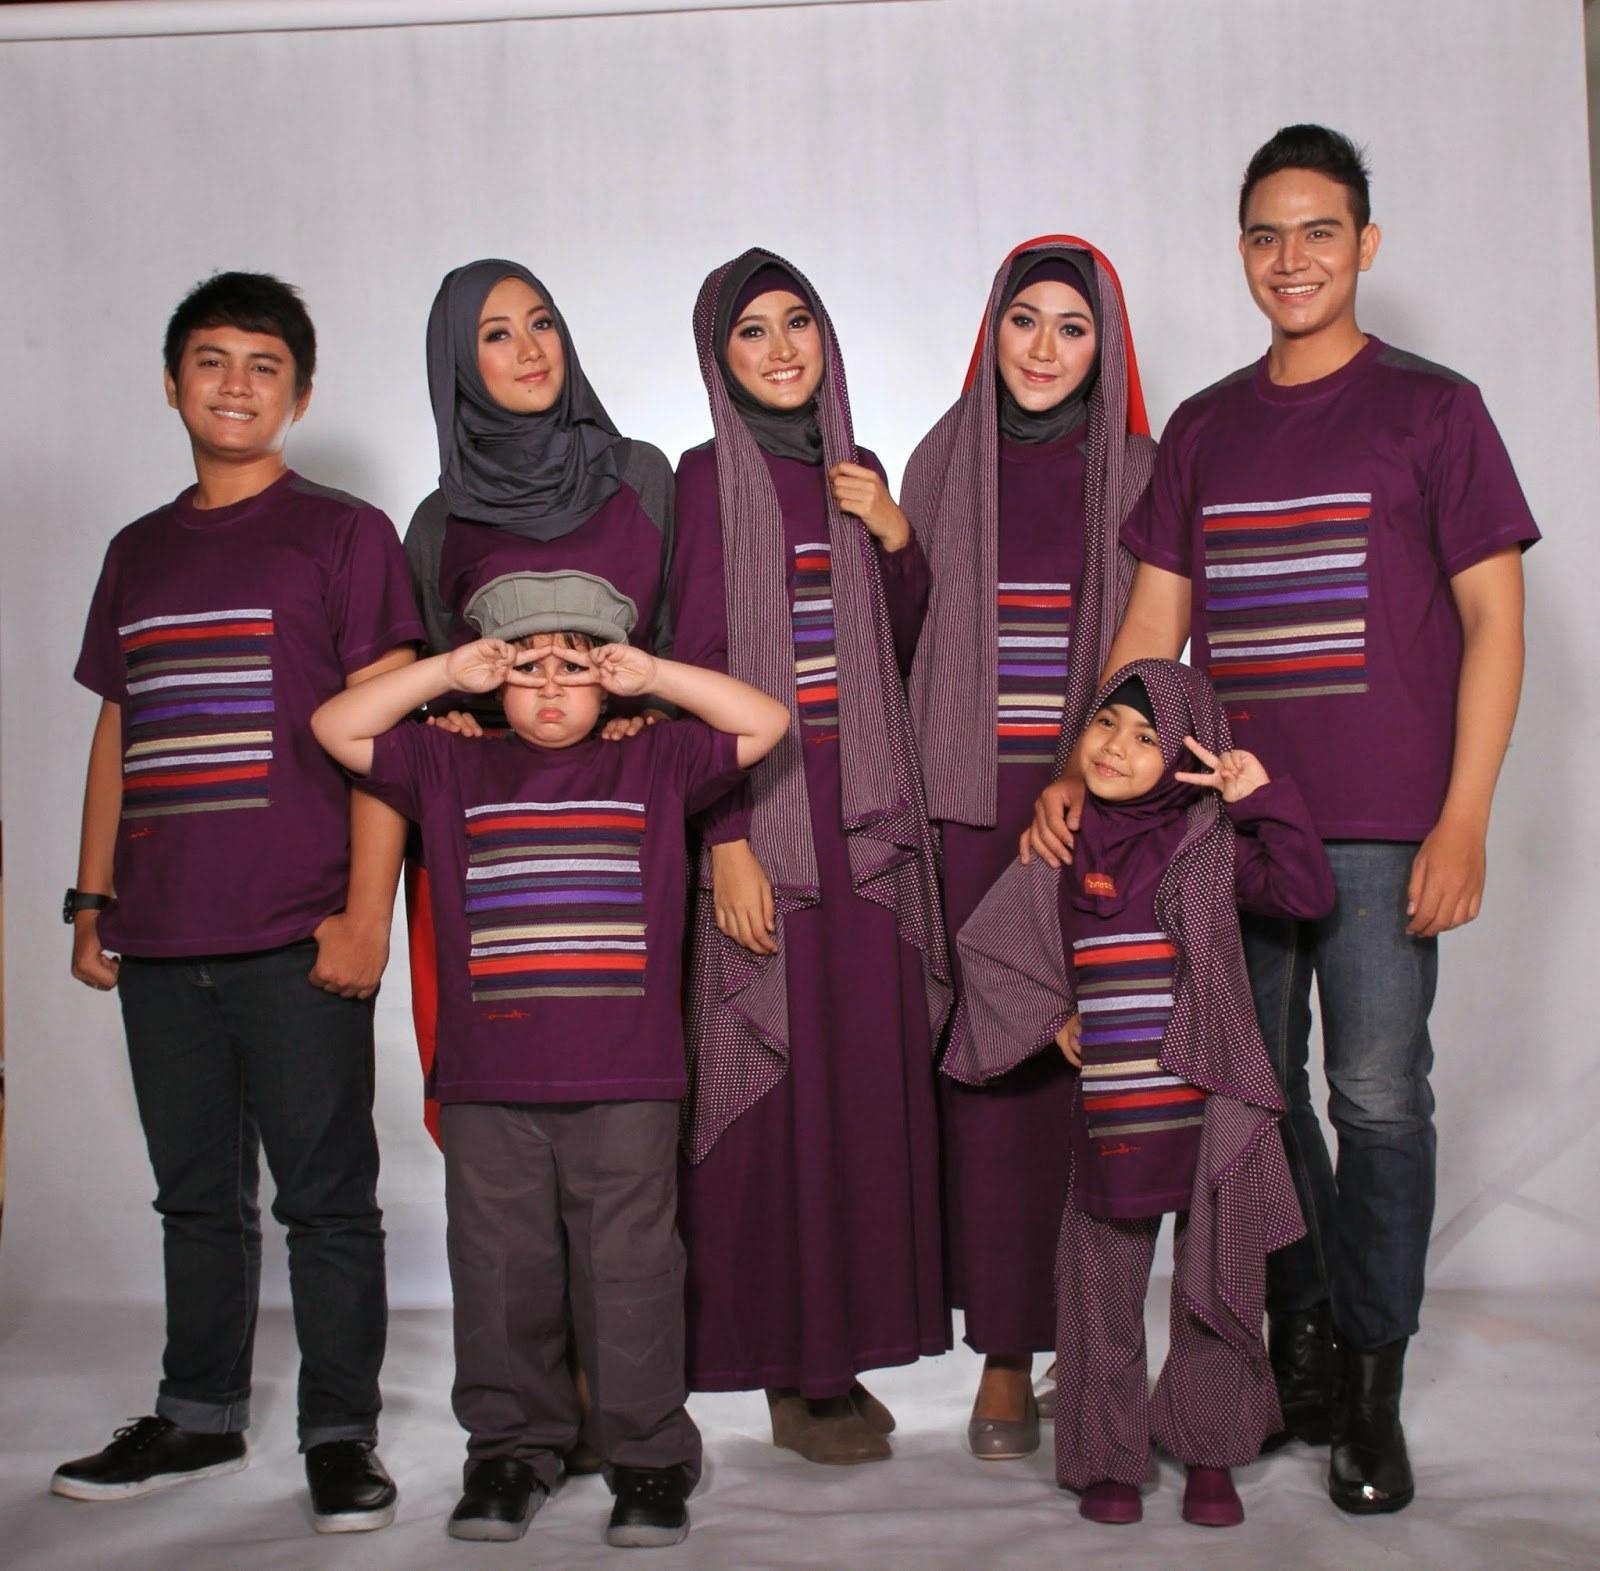 Inspirasi Baju Lebaran Kembar Keluarga Gdd0 Model Baju Keluarga Muslim Seragam Kembar Terbaru 2018